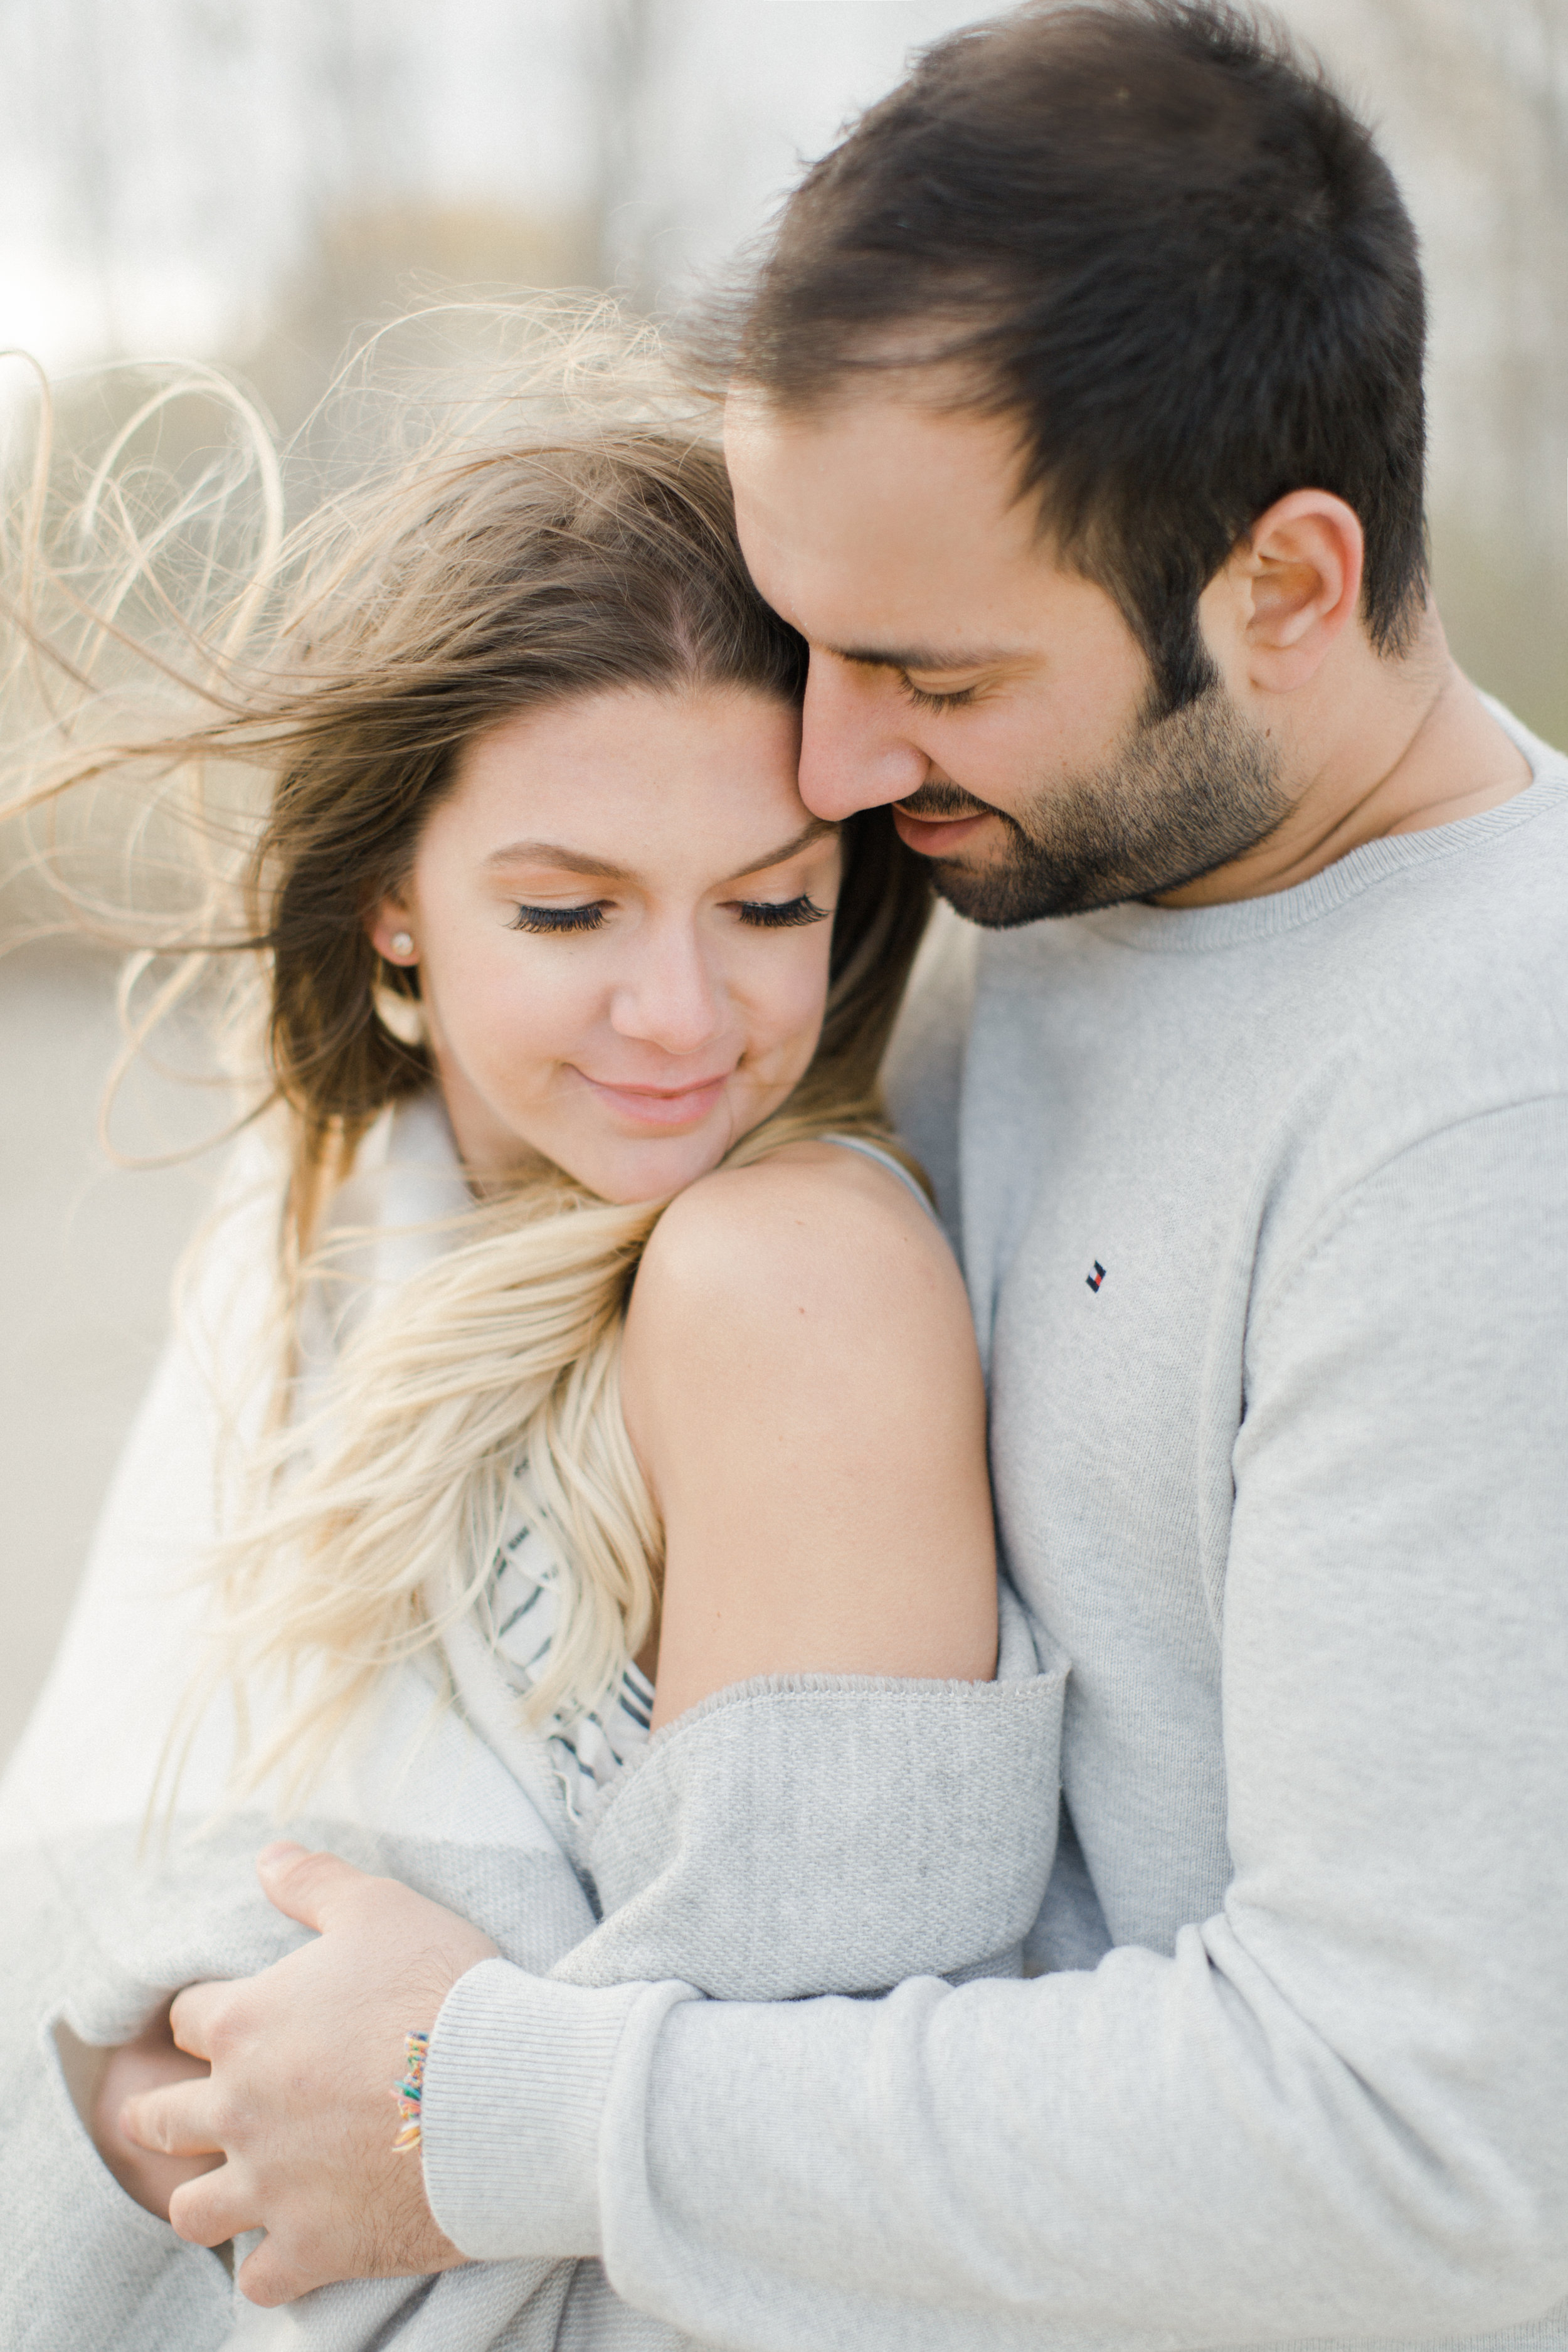 ashbridges-bay-toronto-wedding-photographer-soft-bright-pretty-pastel-richelle-hunter-lauren-miller-heather-chris-previews-6.jpg